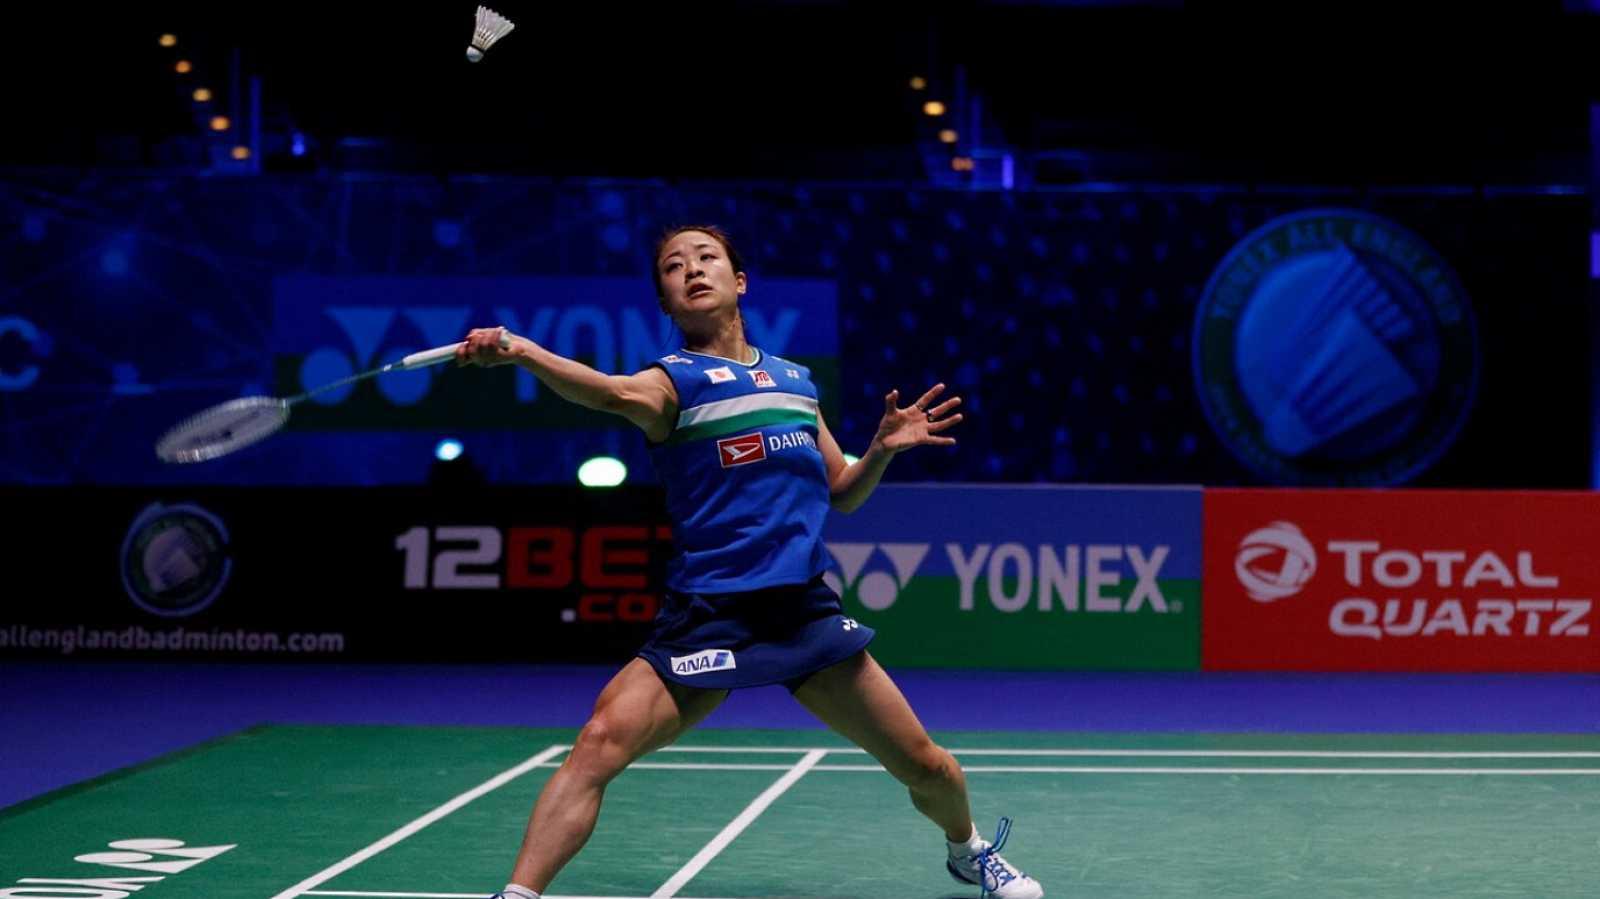 Bádminton - Yonex all England Open. Final individual femenina: P. Chochuwong - N. Okuhara - ver ahora